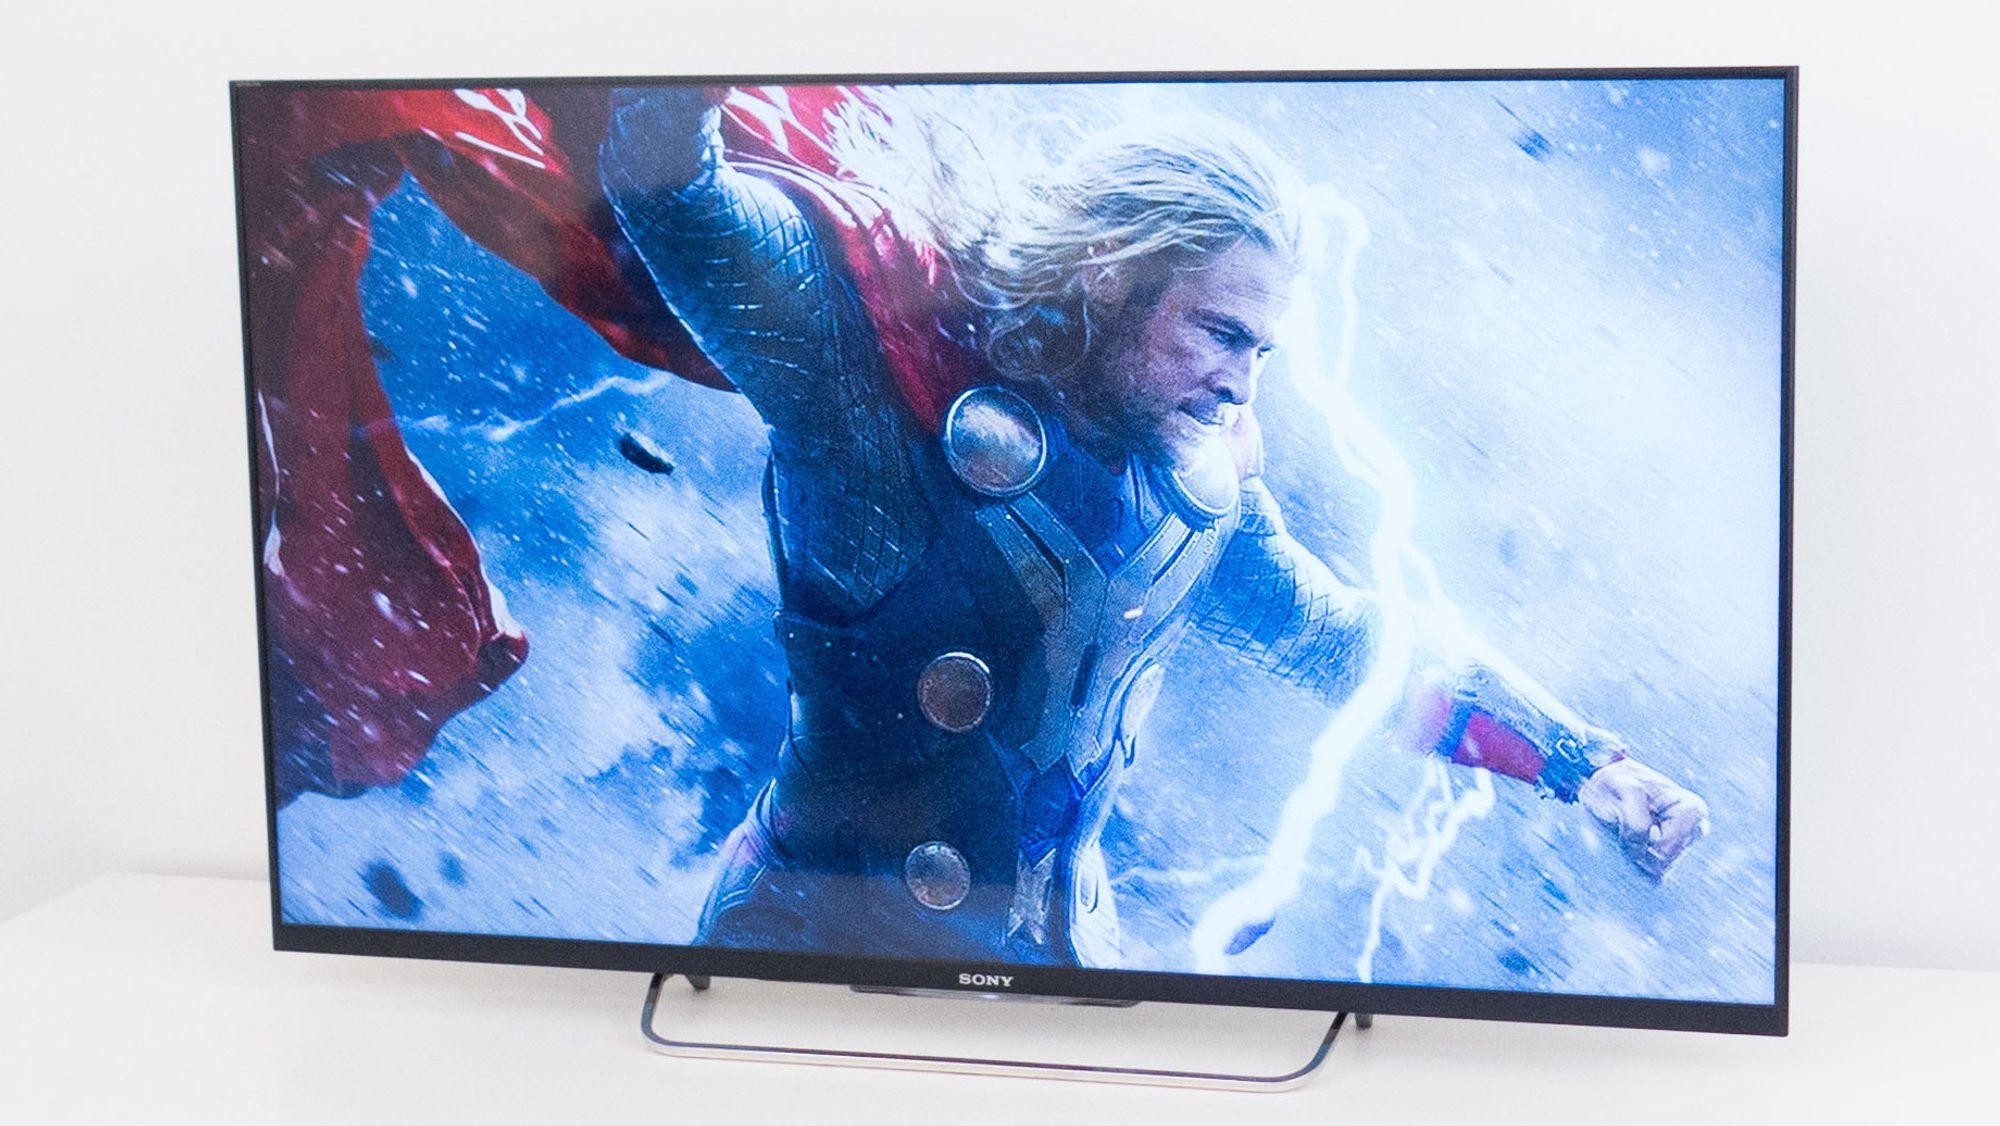 Les Den beste TV-en vi har testet til under 10 000 kroner